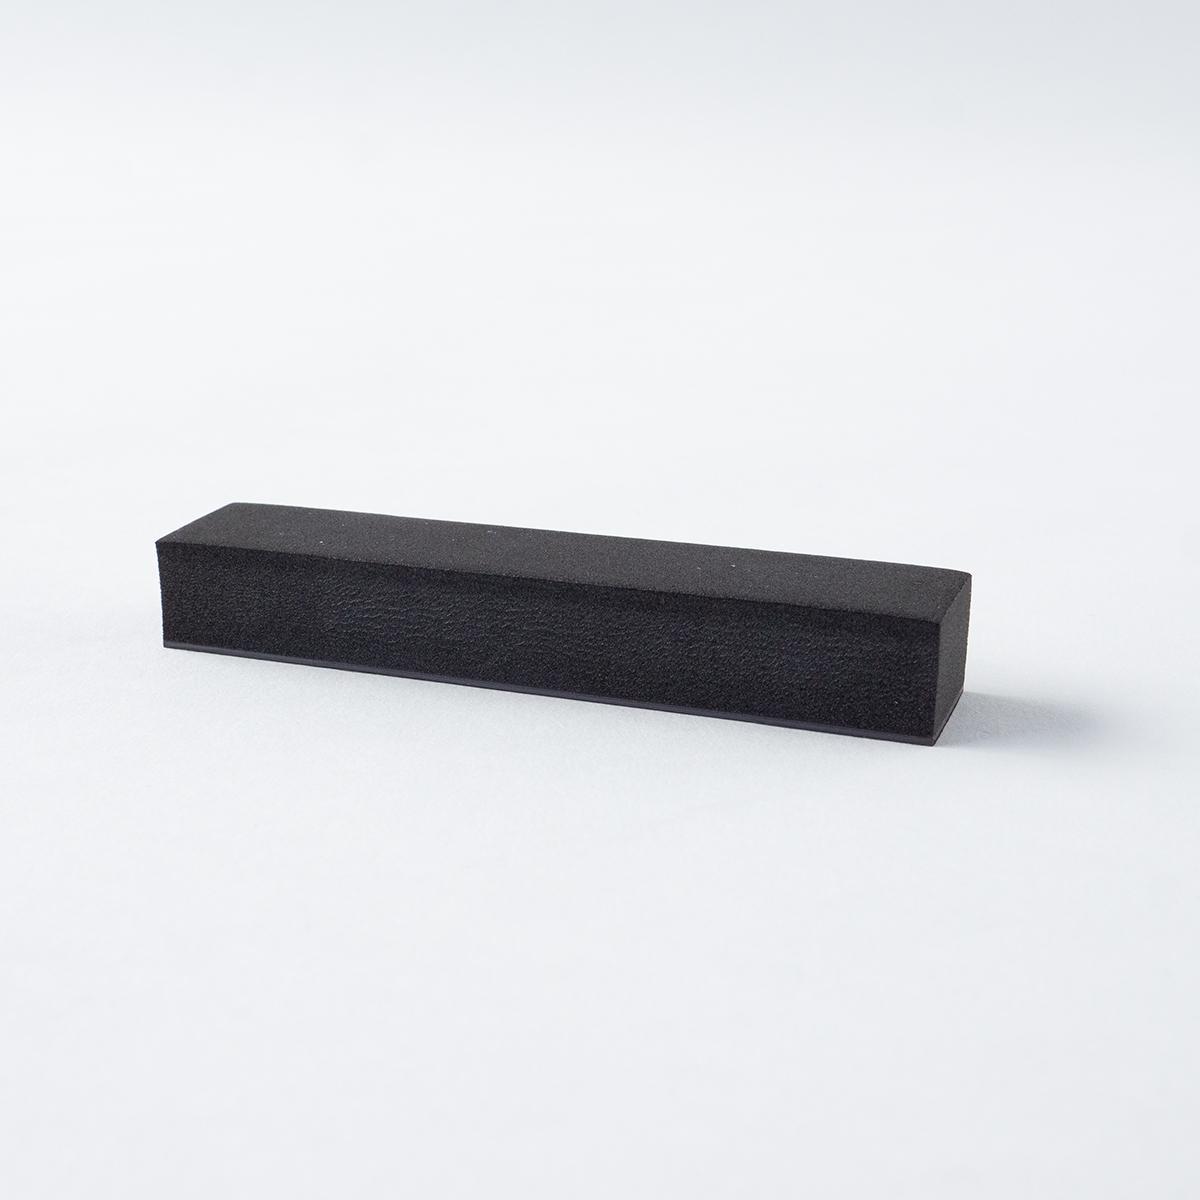 【 BLACK BAR ERASER 3個入 】汚れを溜め込むフェルトとはお別れ  ホワイトボード周りが美しくなるイレーザー